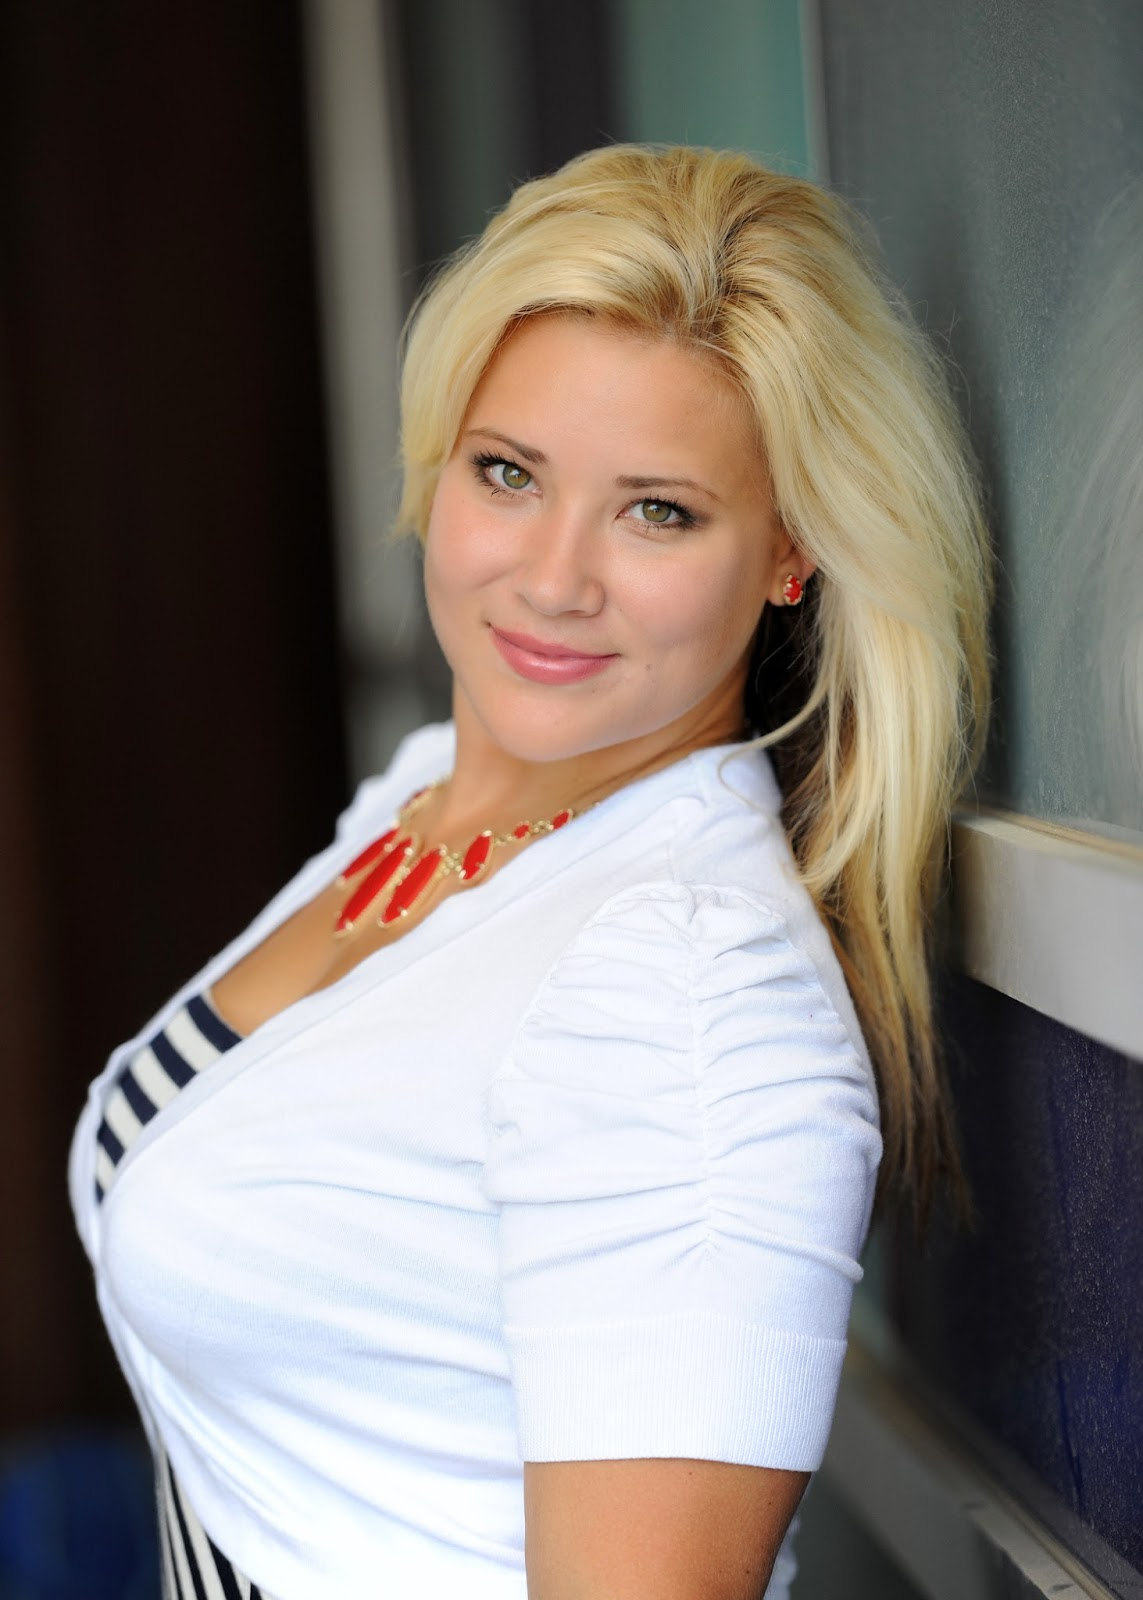 Cheri Garcia